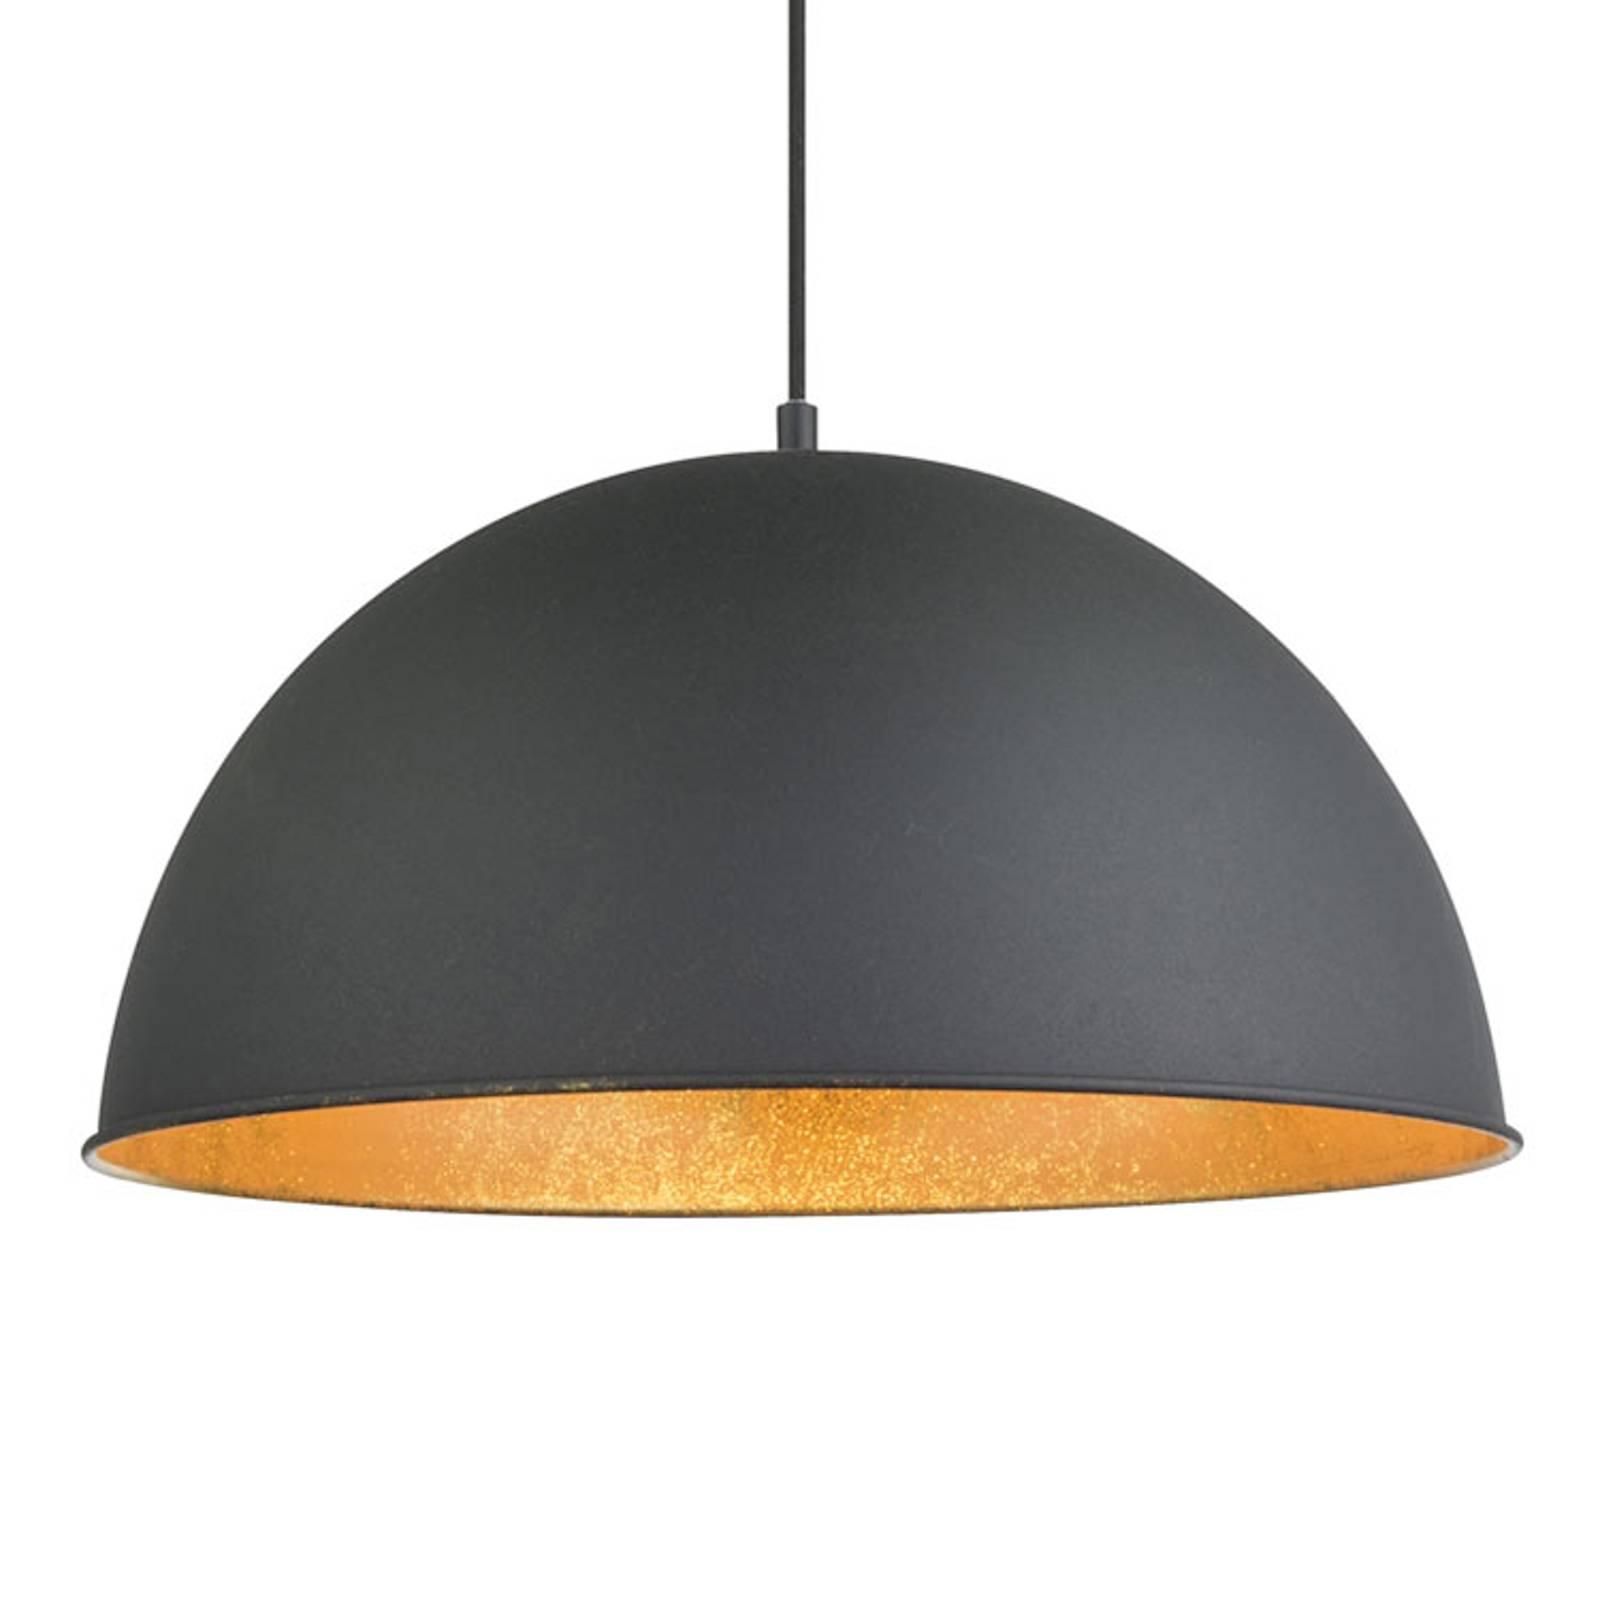 Zwart-gouden hanglamp Lenn